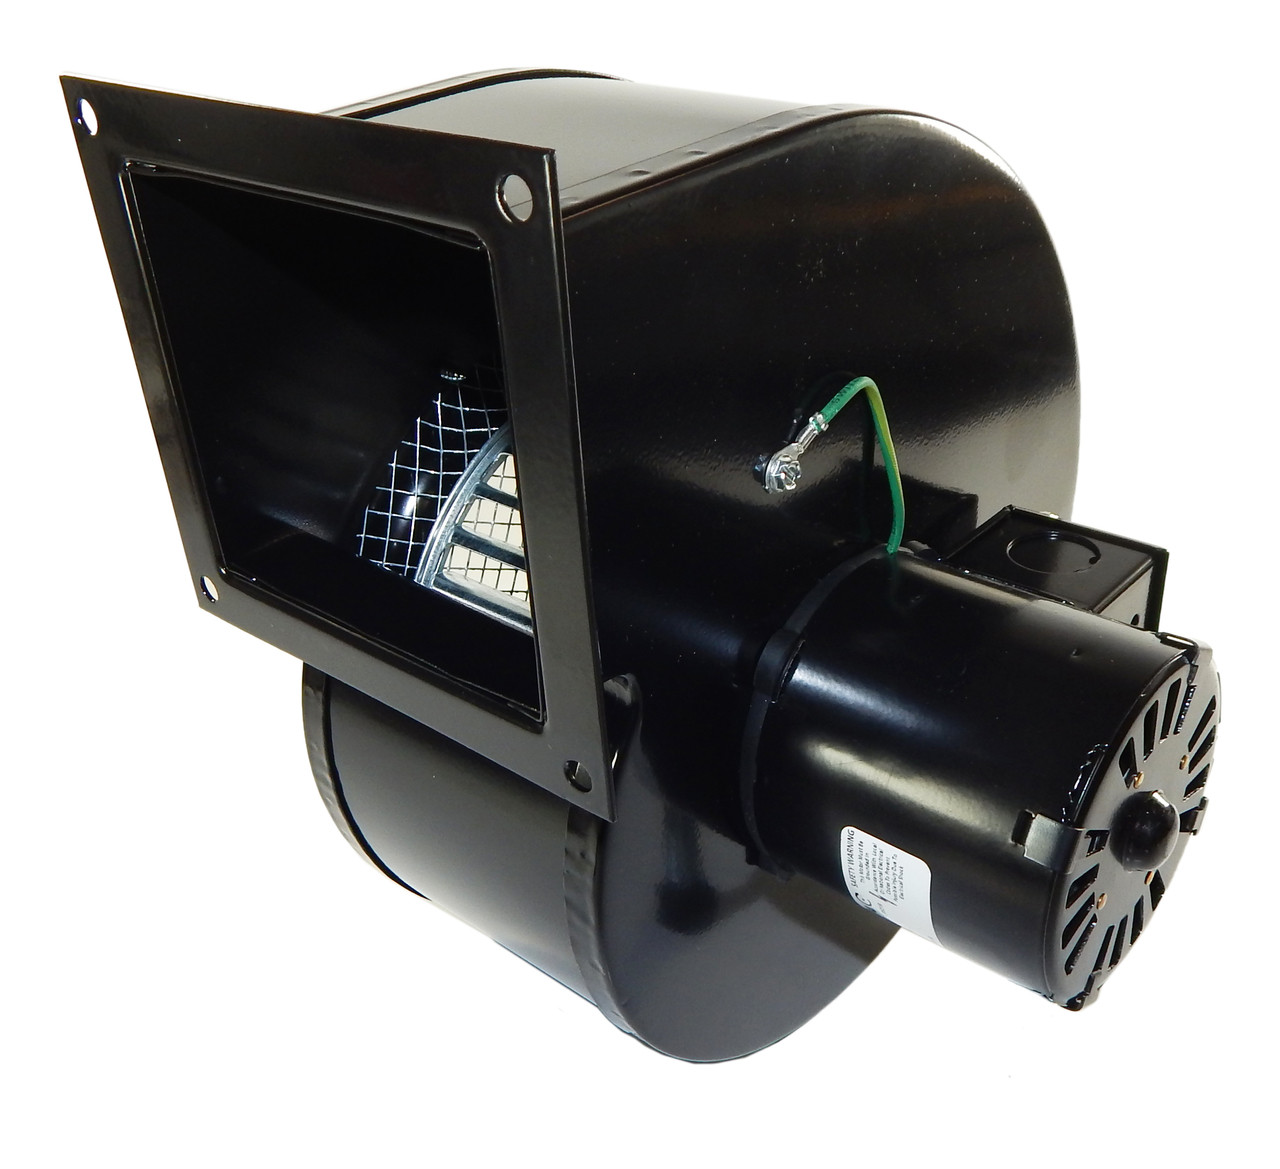 Centrifugal Blower (4C447, 1TDR3, PU-4C447) 115V Fasco # B45227 on